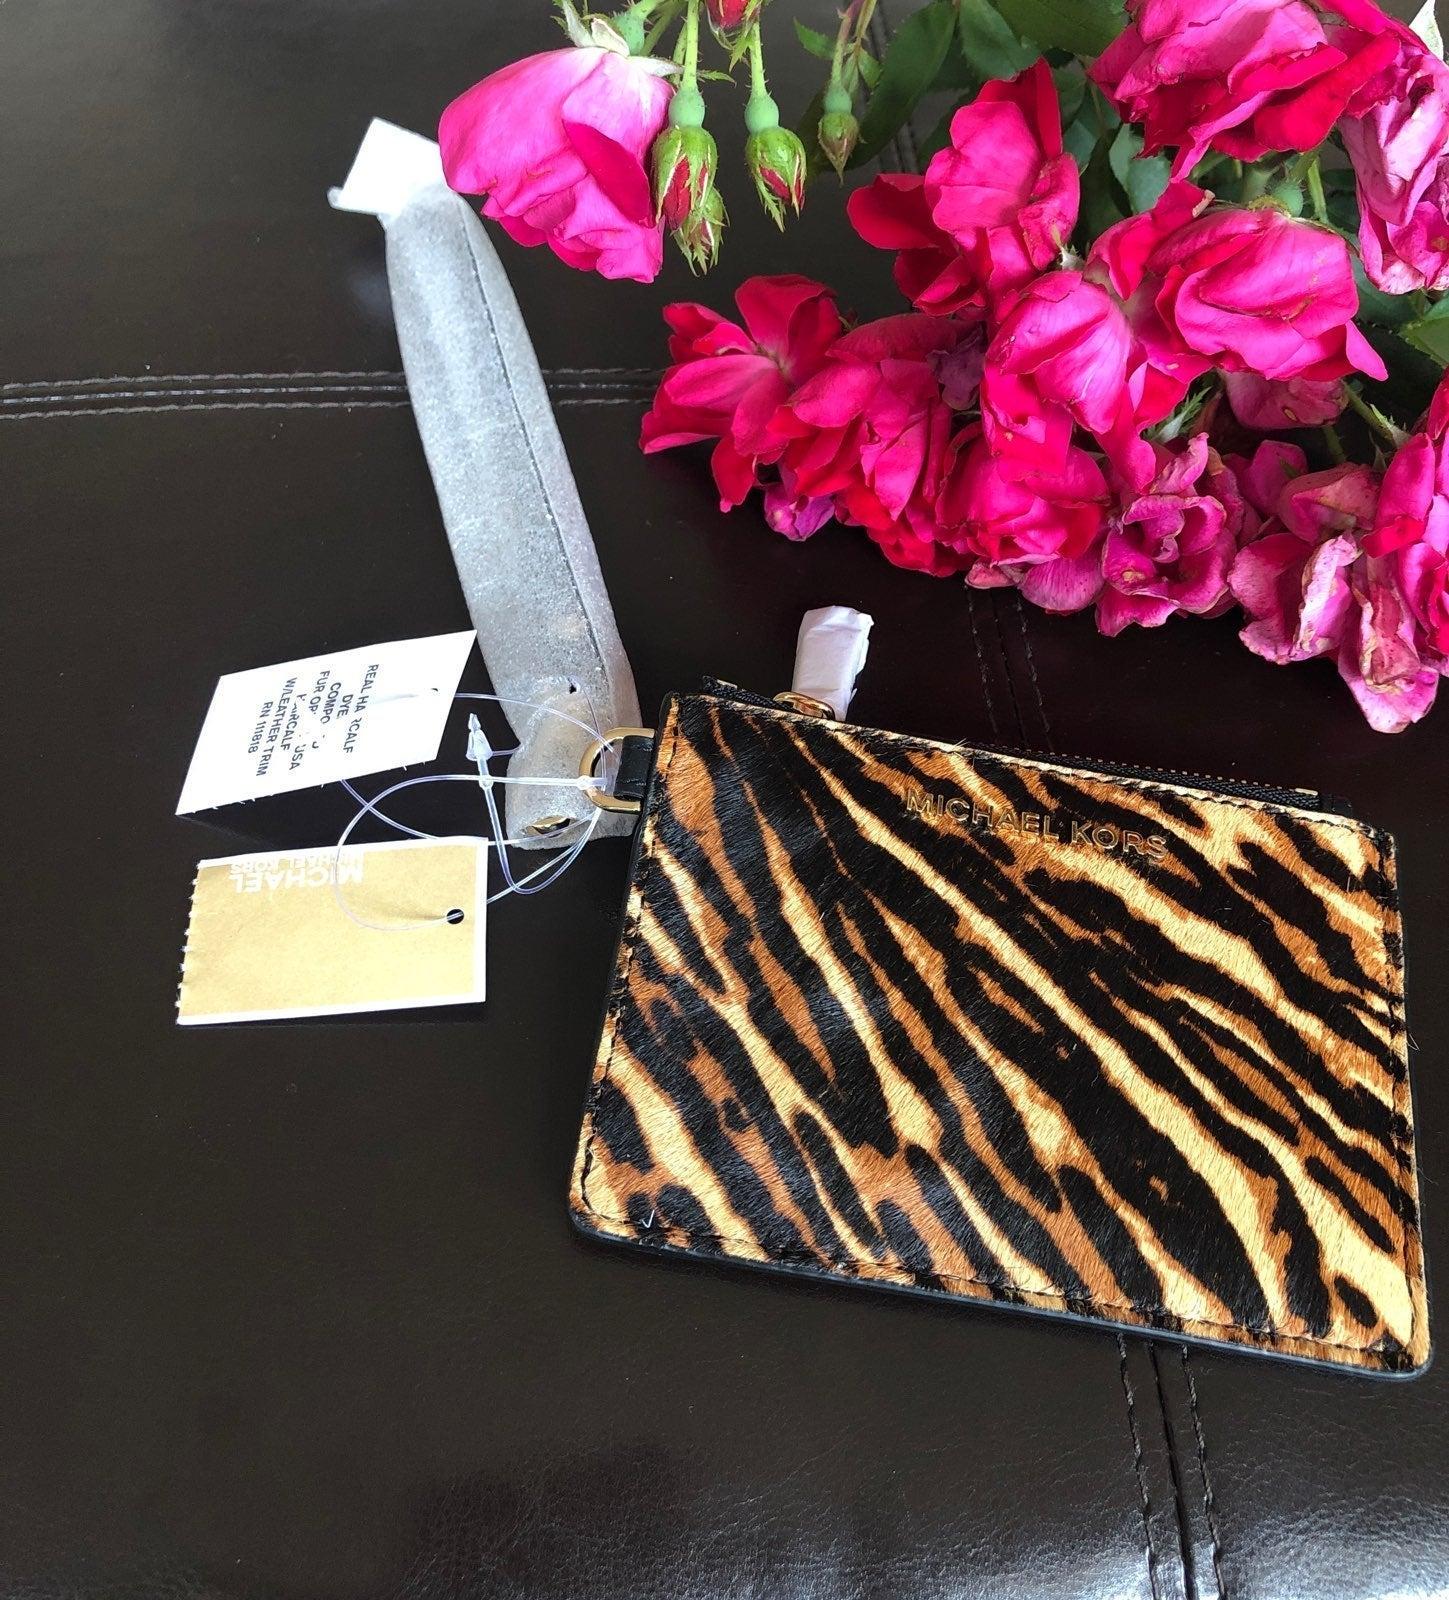 Michael Kors jet set small coin purse